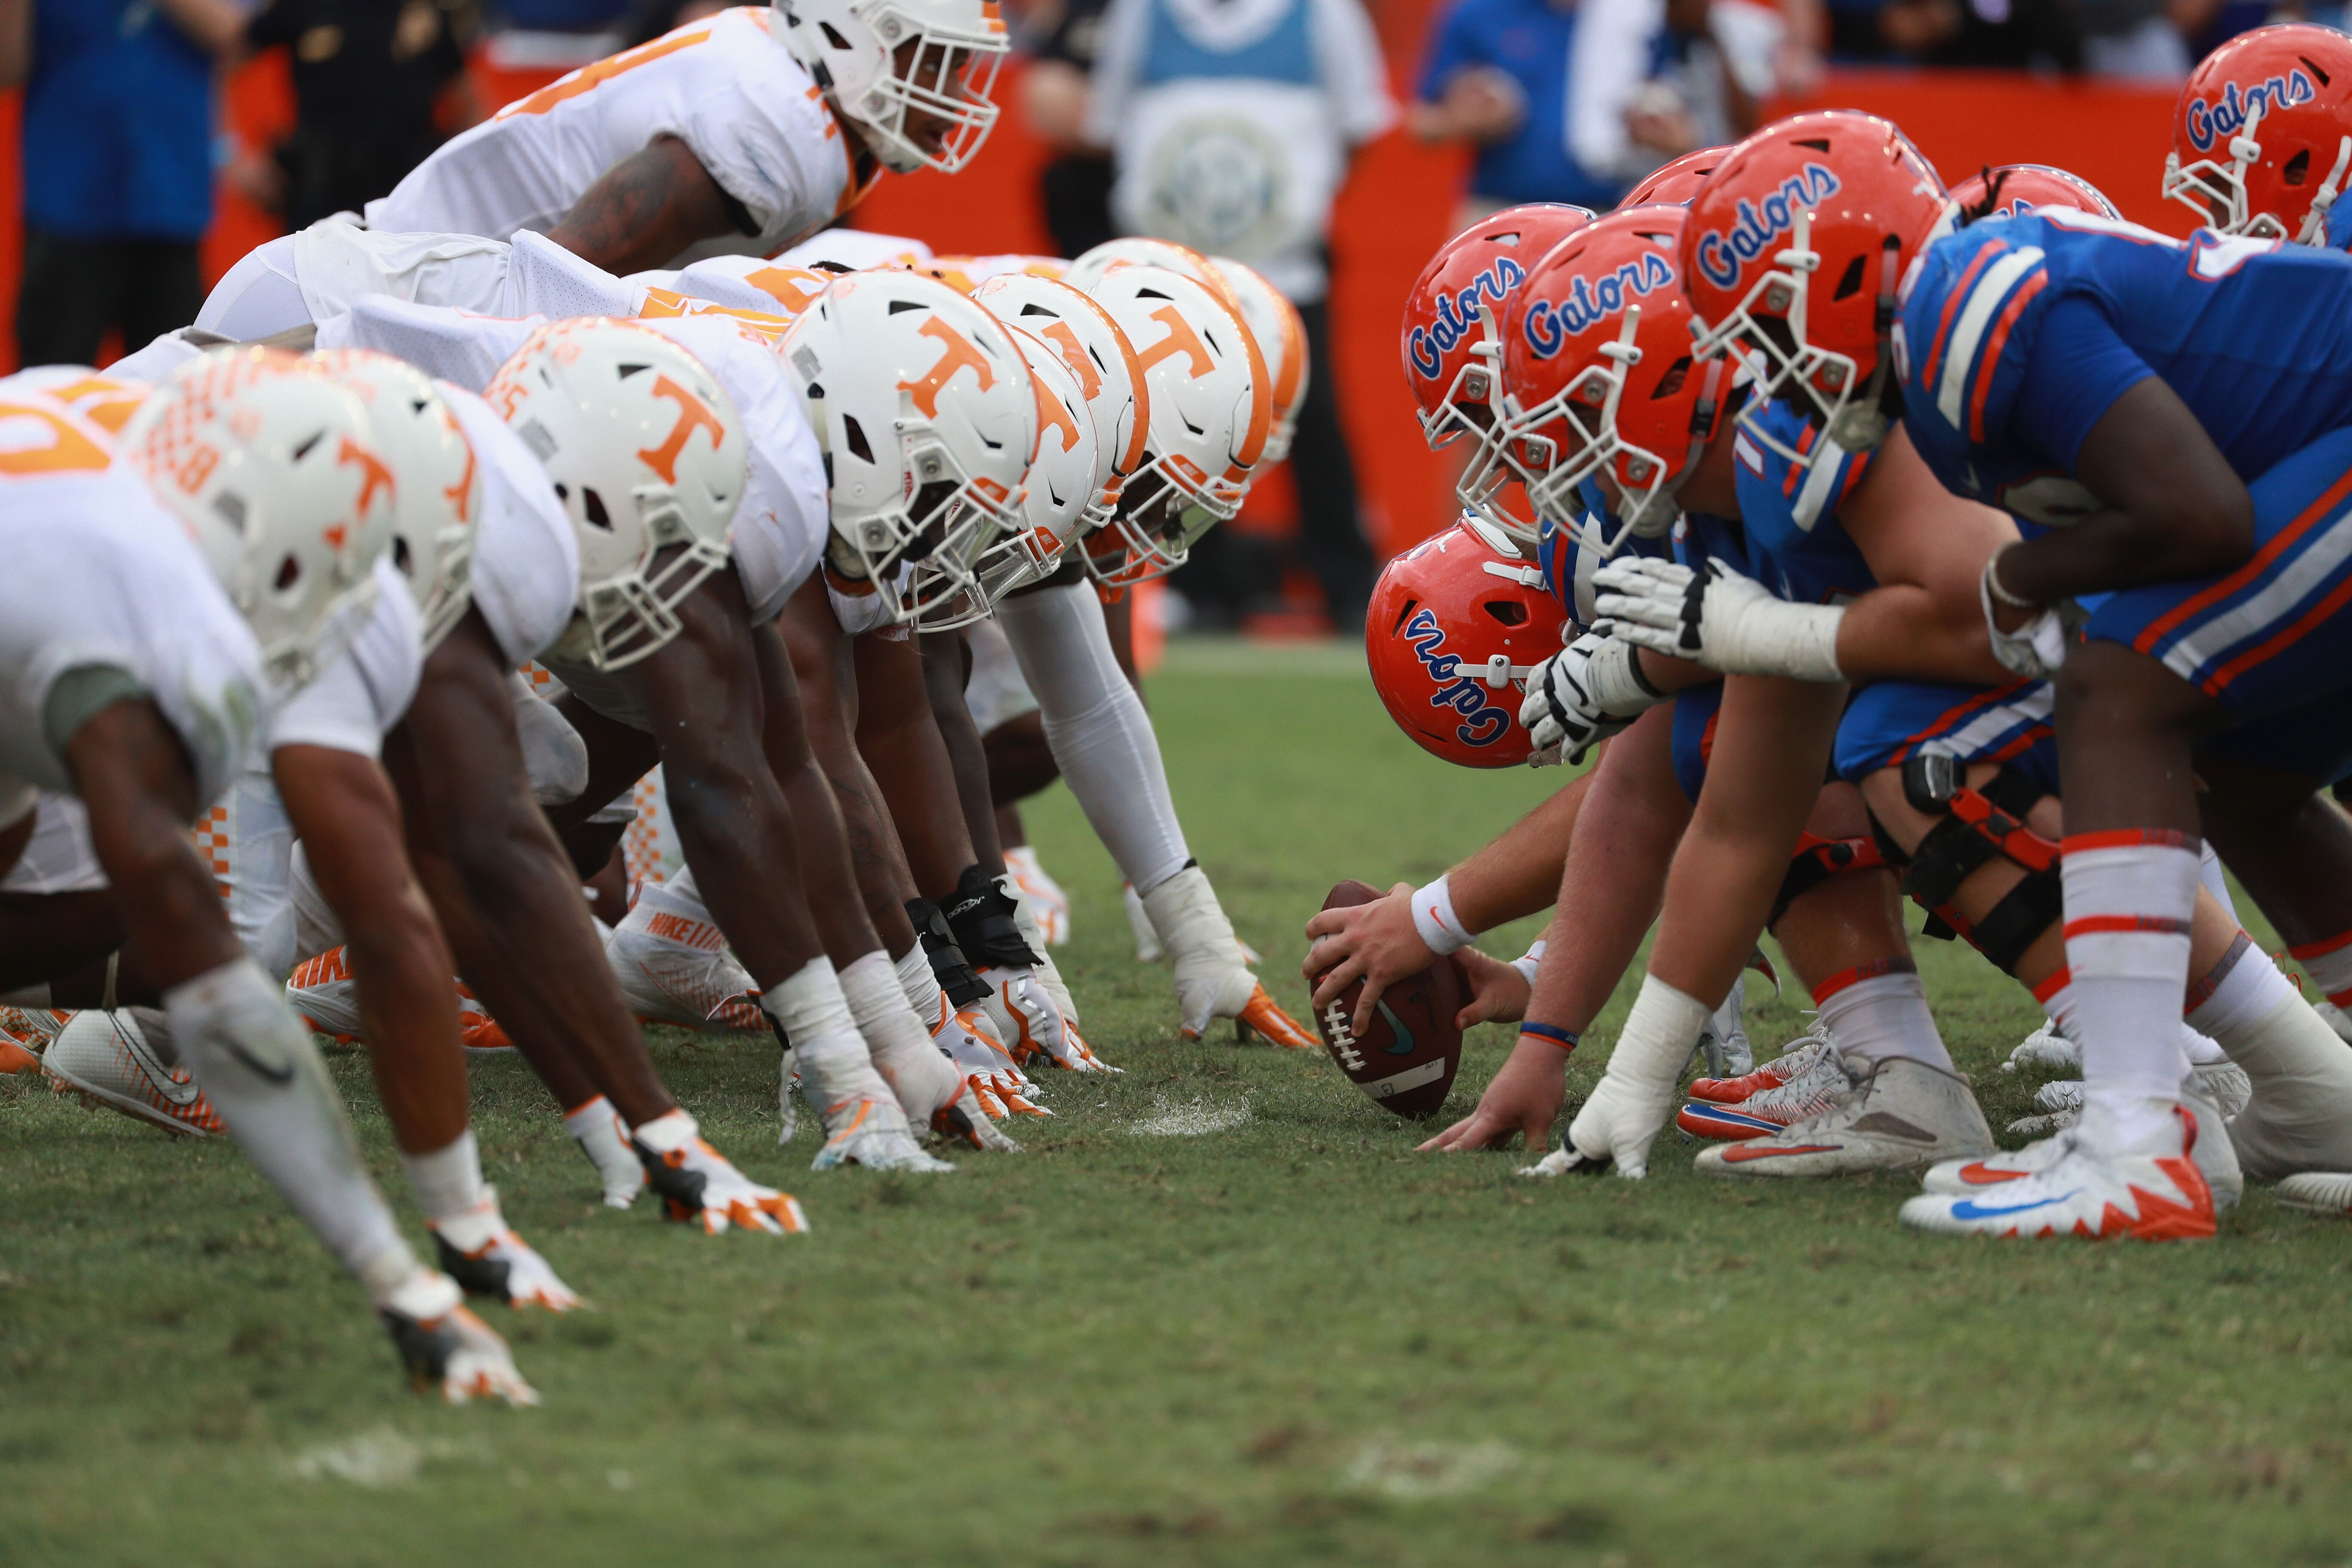 Tennessee football at Florida: 10 keys for Vols and Gators